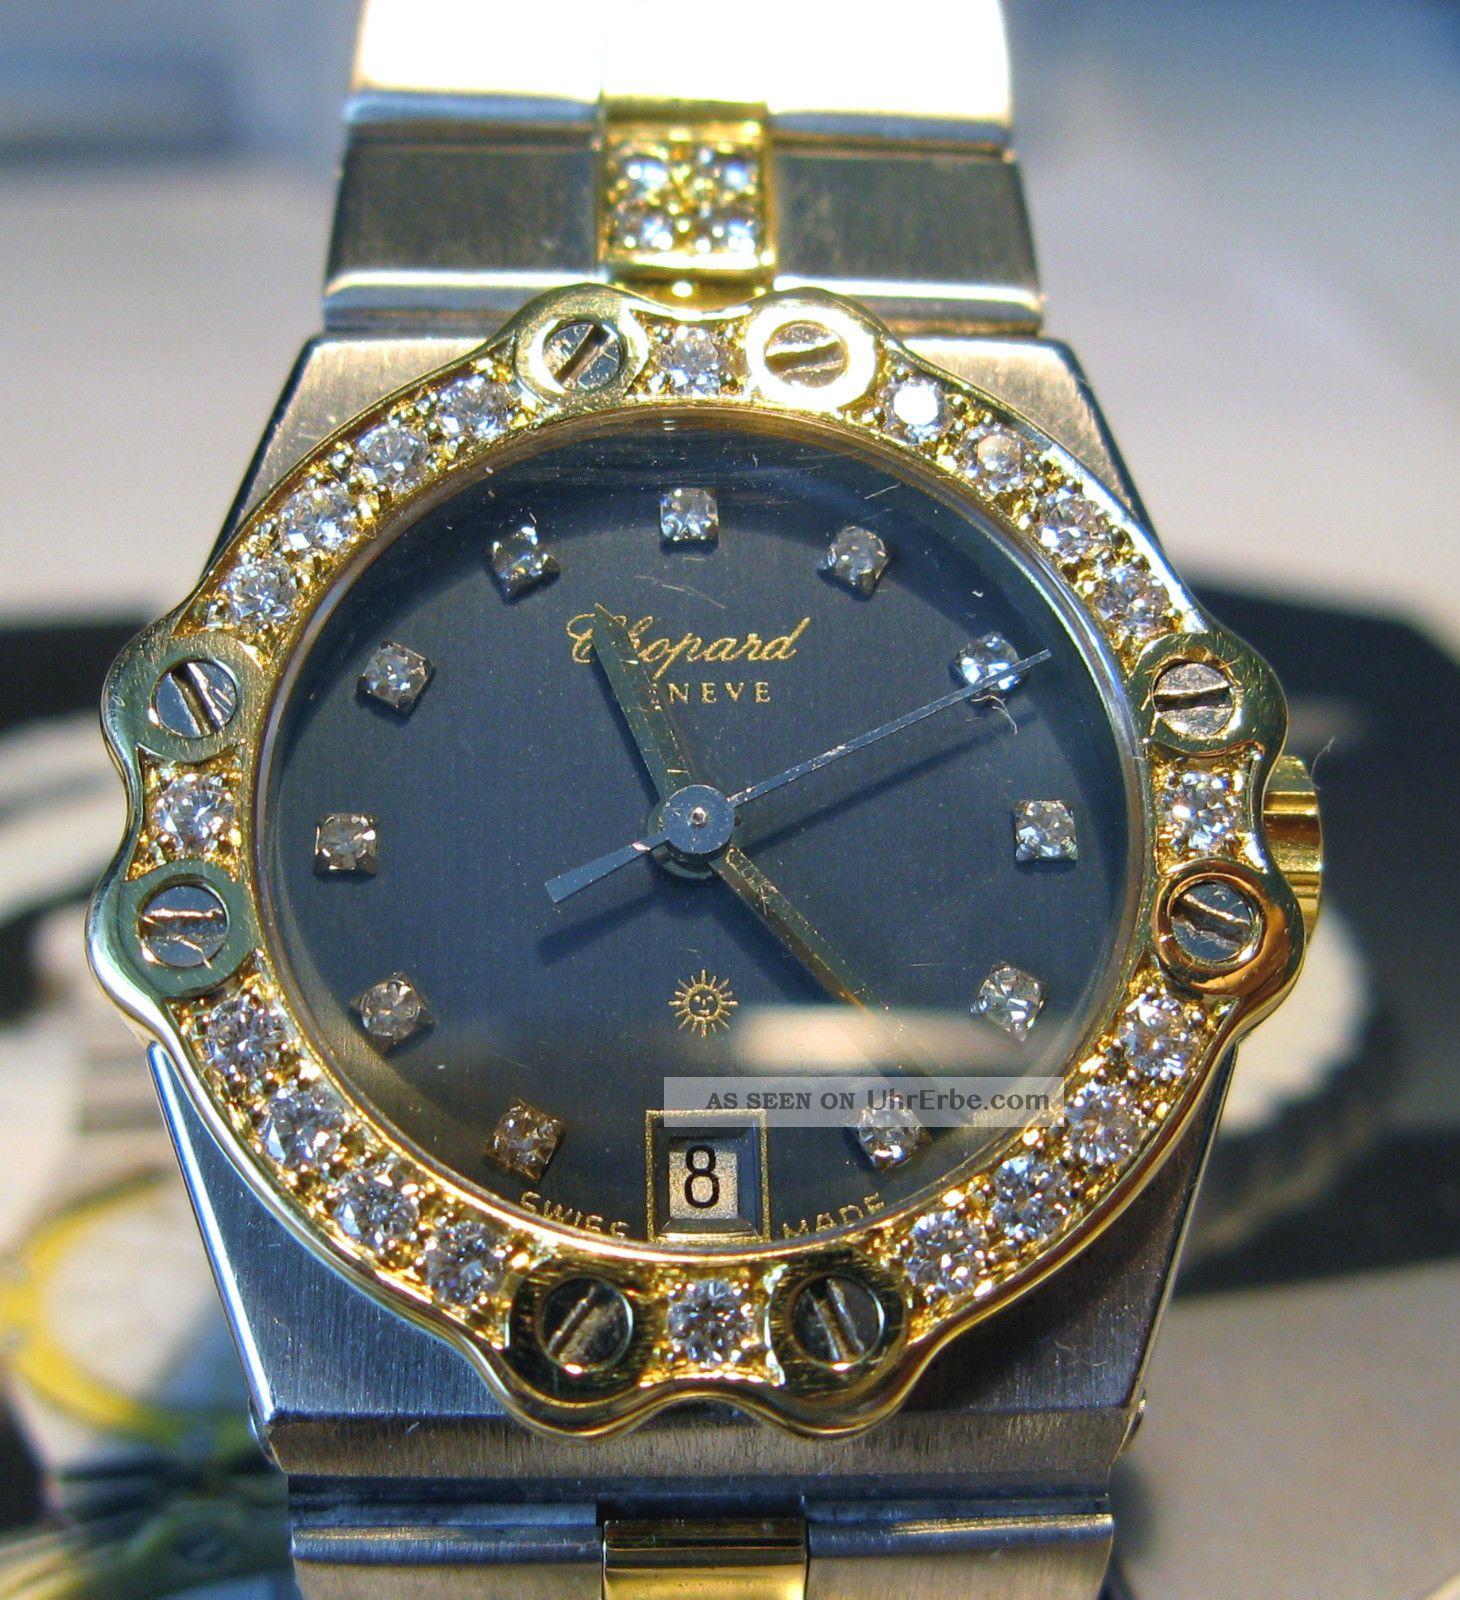 Damen Chopard St Moritz Uhr Stahl - Gold DiamantlÜnette In 18ct Gold Armbanduhren Bild